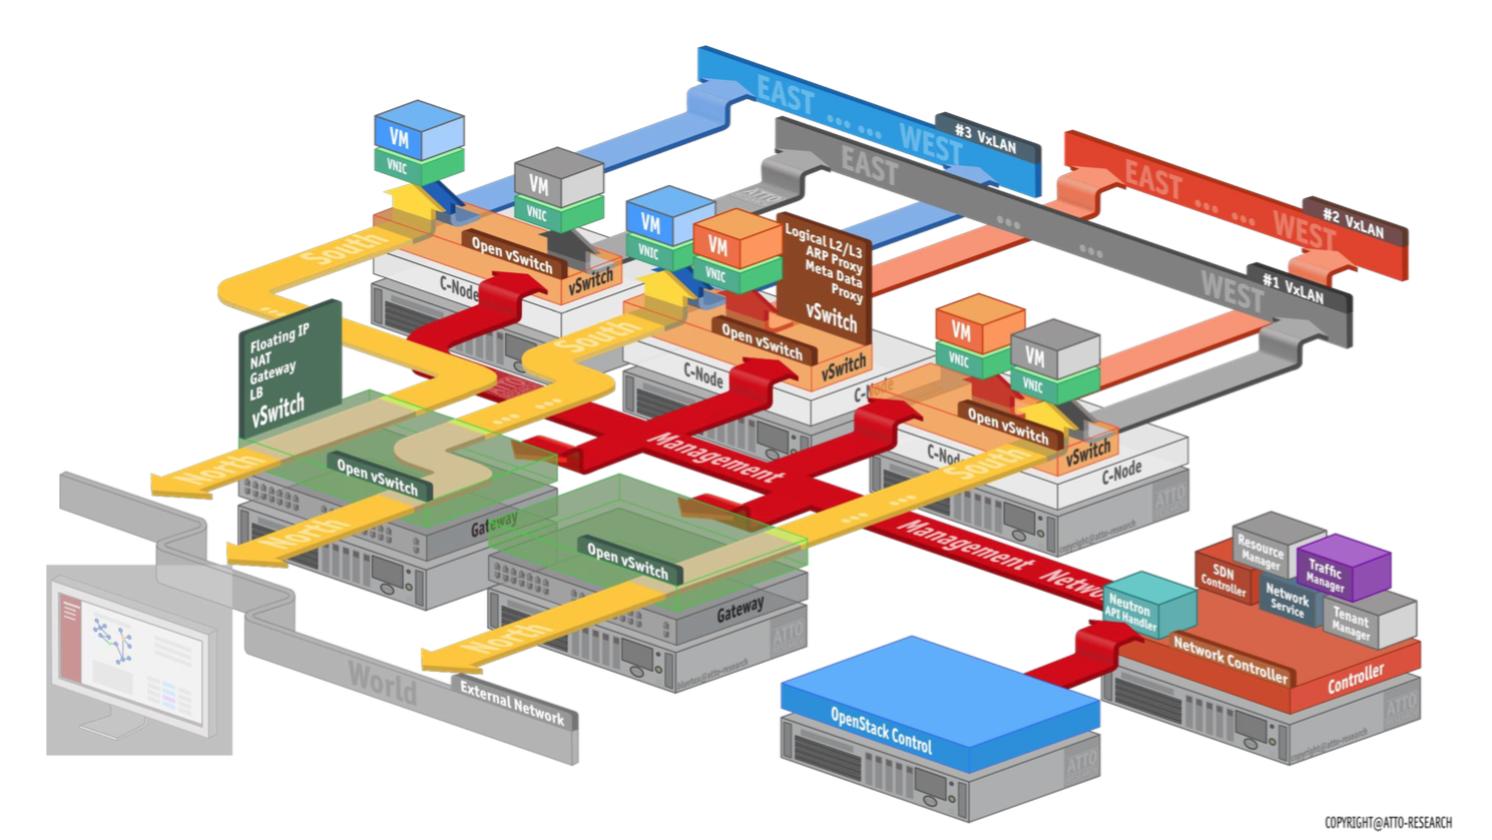 DC Network Virtualization - ONOS 1 5 - Wiki